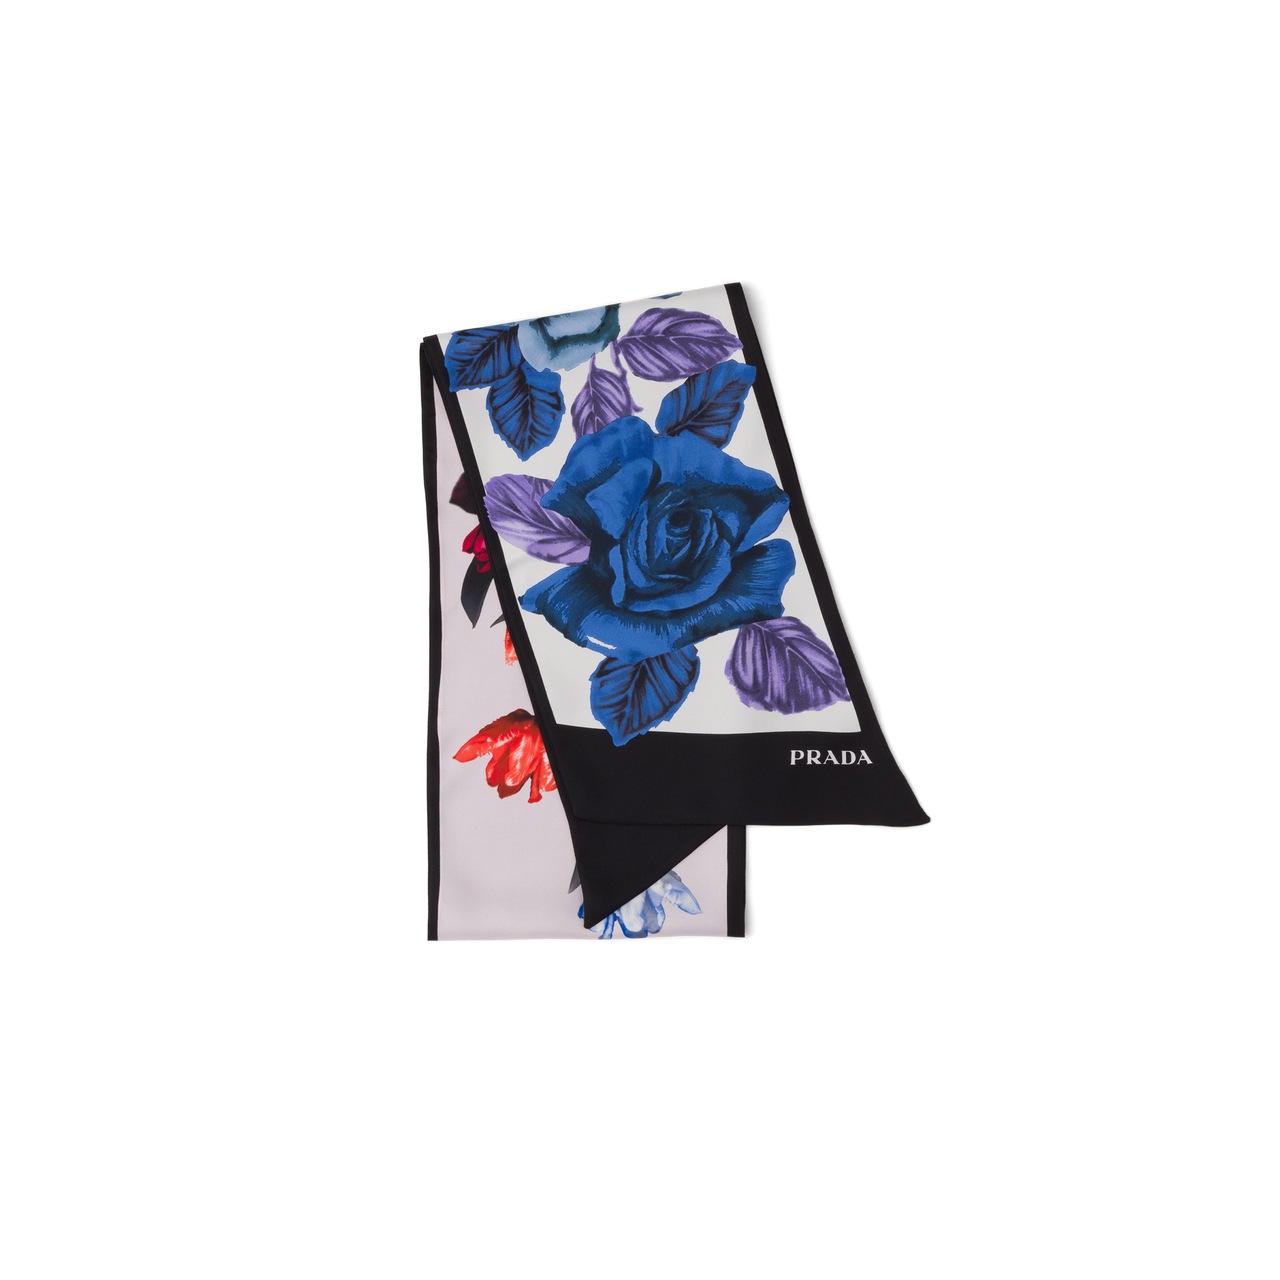 Prada Double Match silk scarf 1